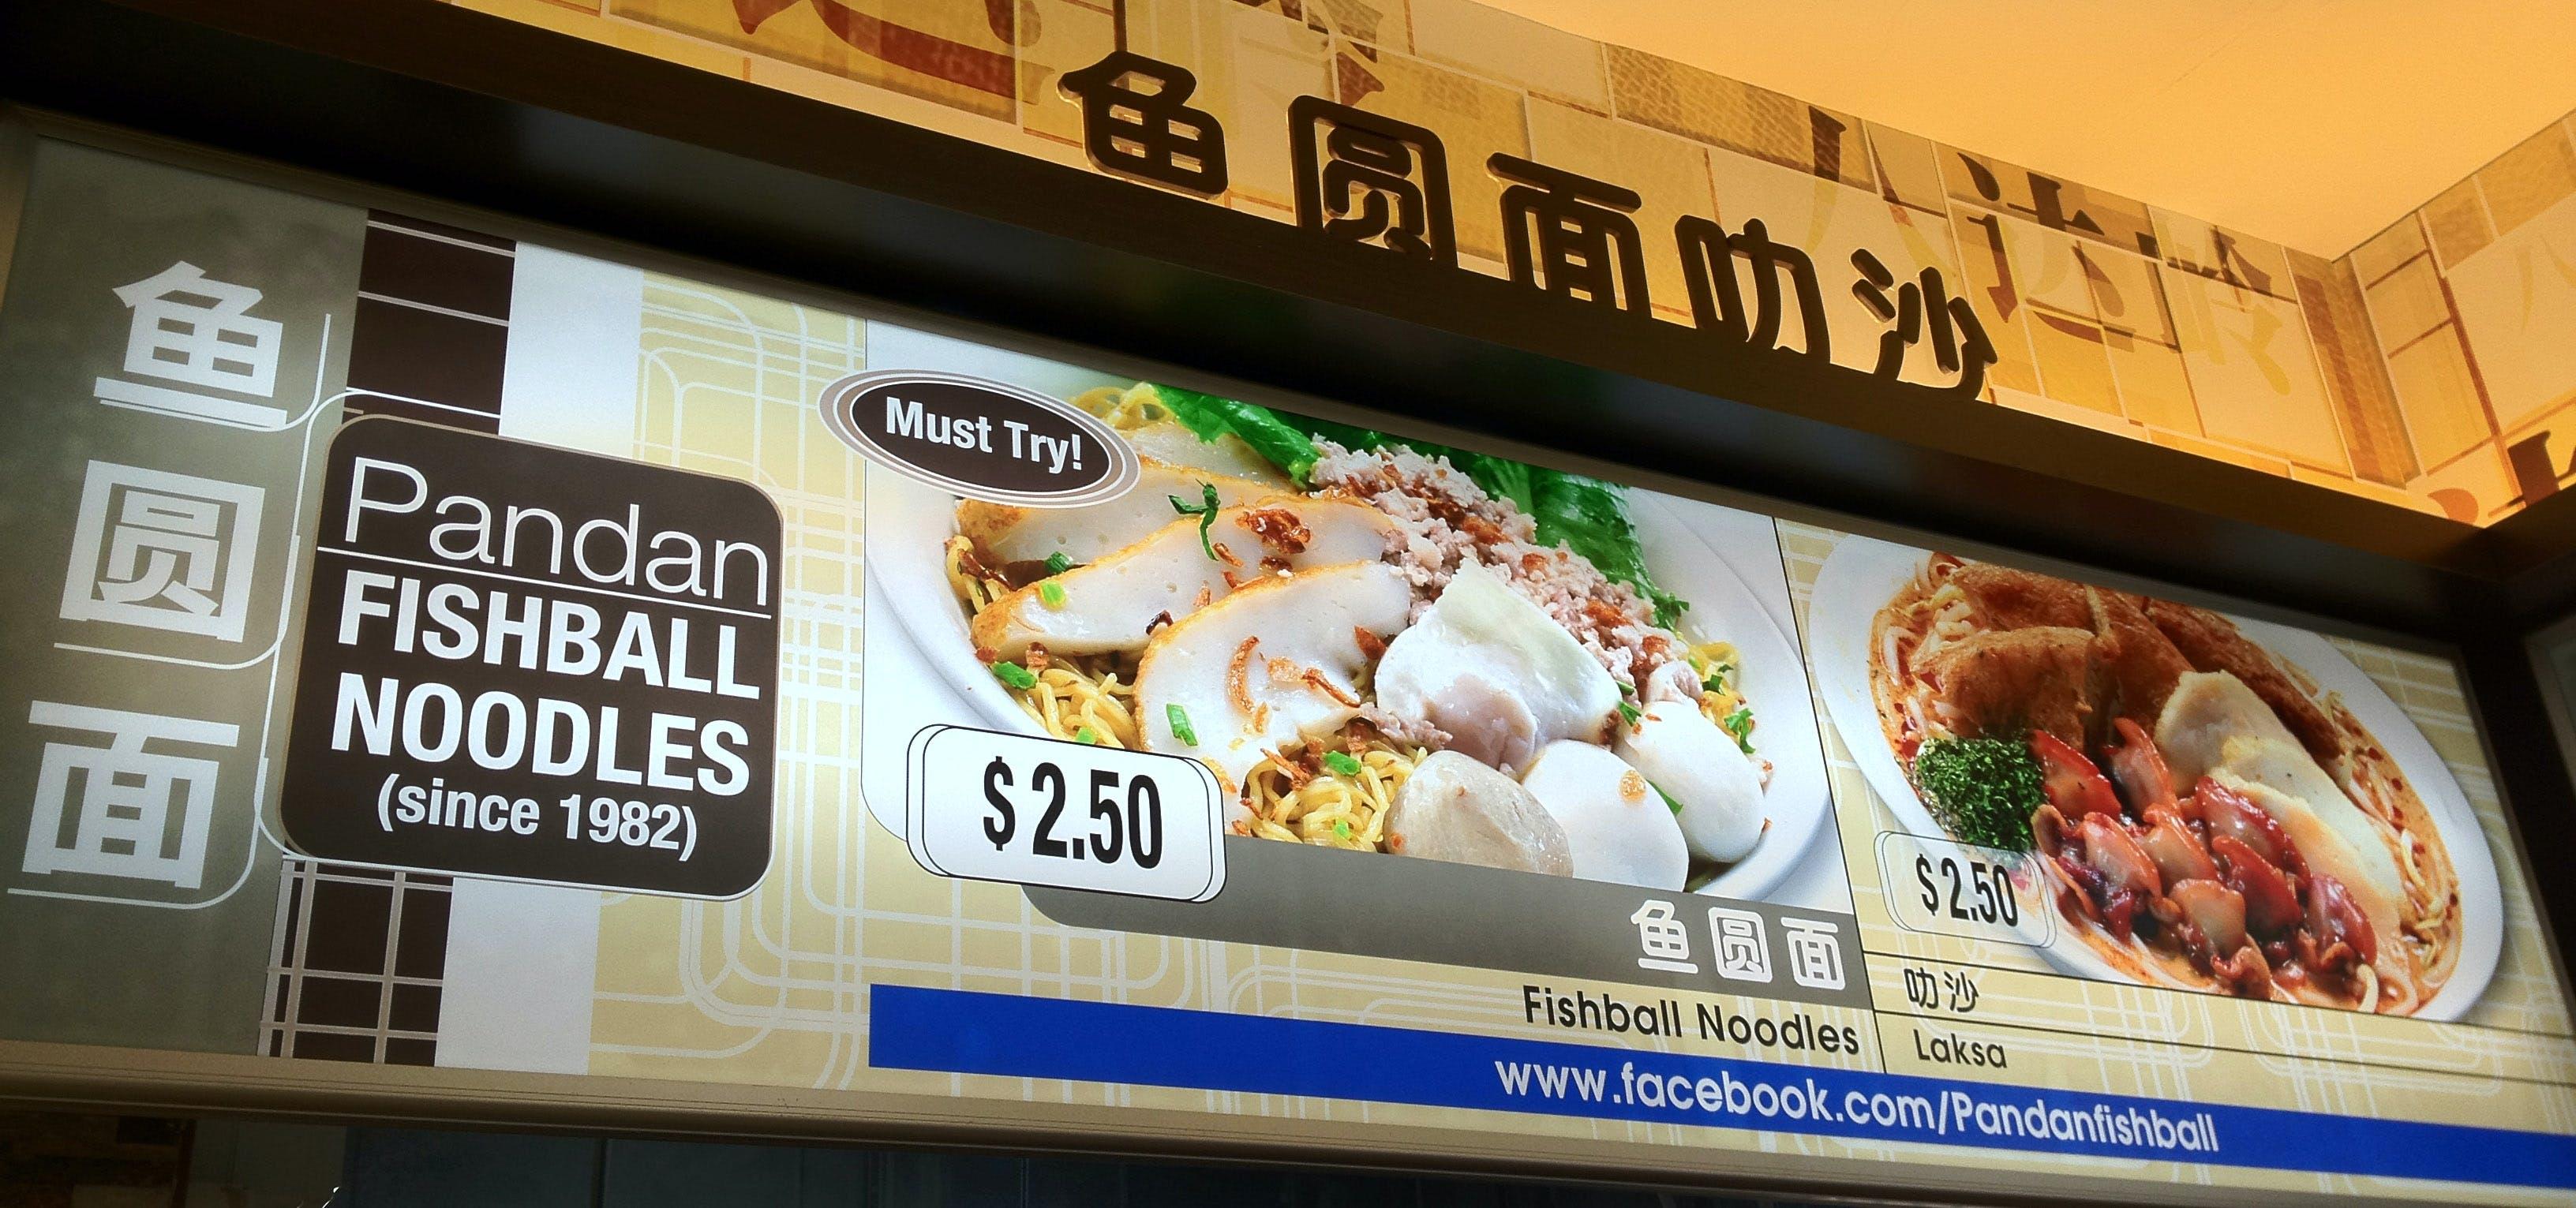 Famous Pandan Fishball noodles at Pandan Gardens